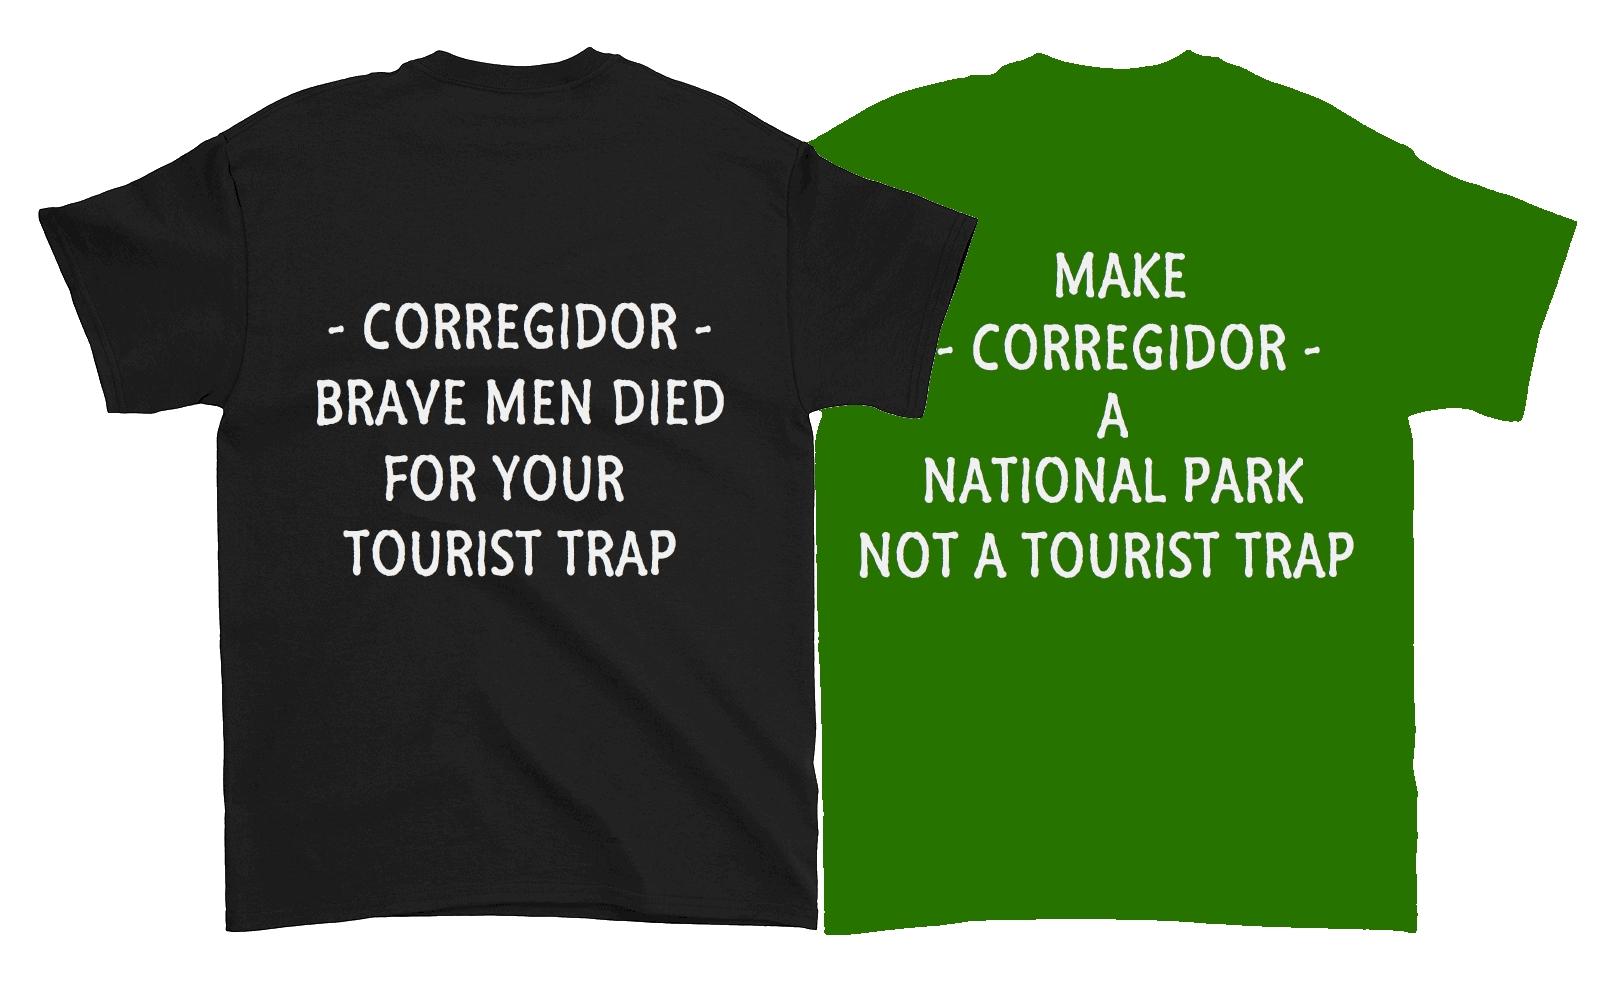 http://corregidor.org/bbbin/tshirts.jpg